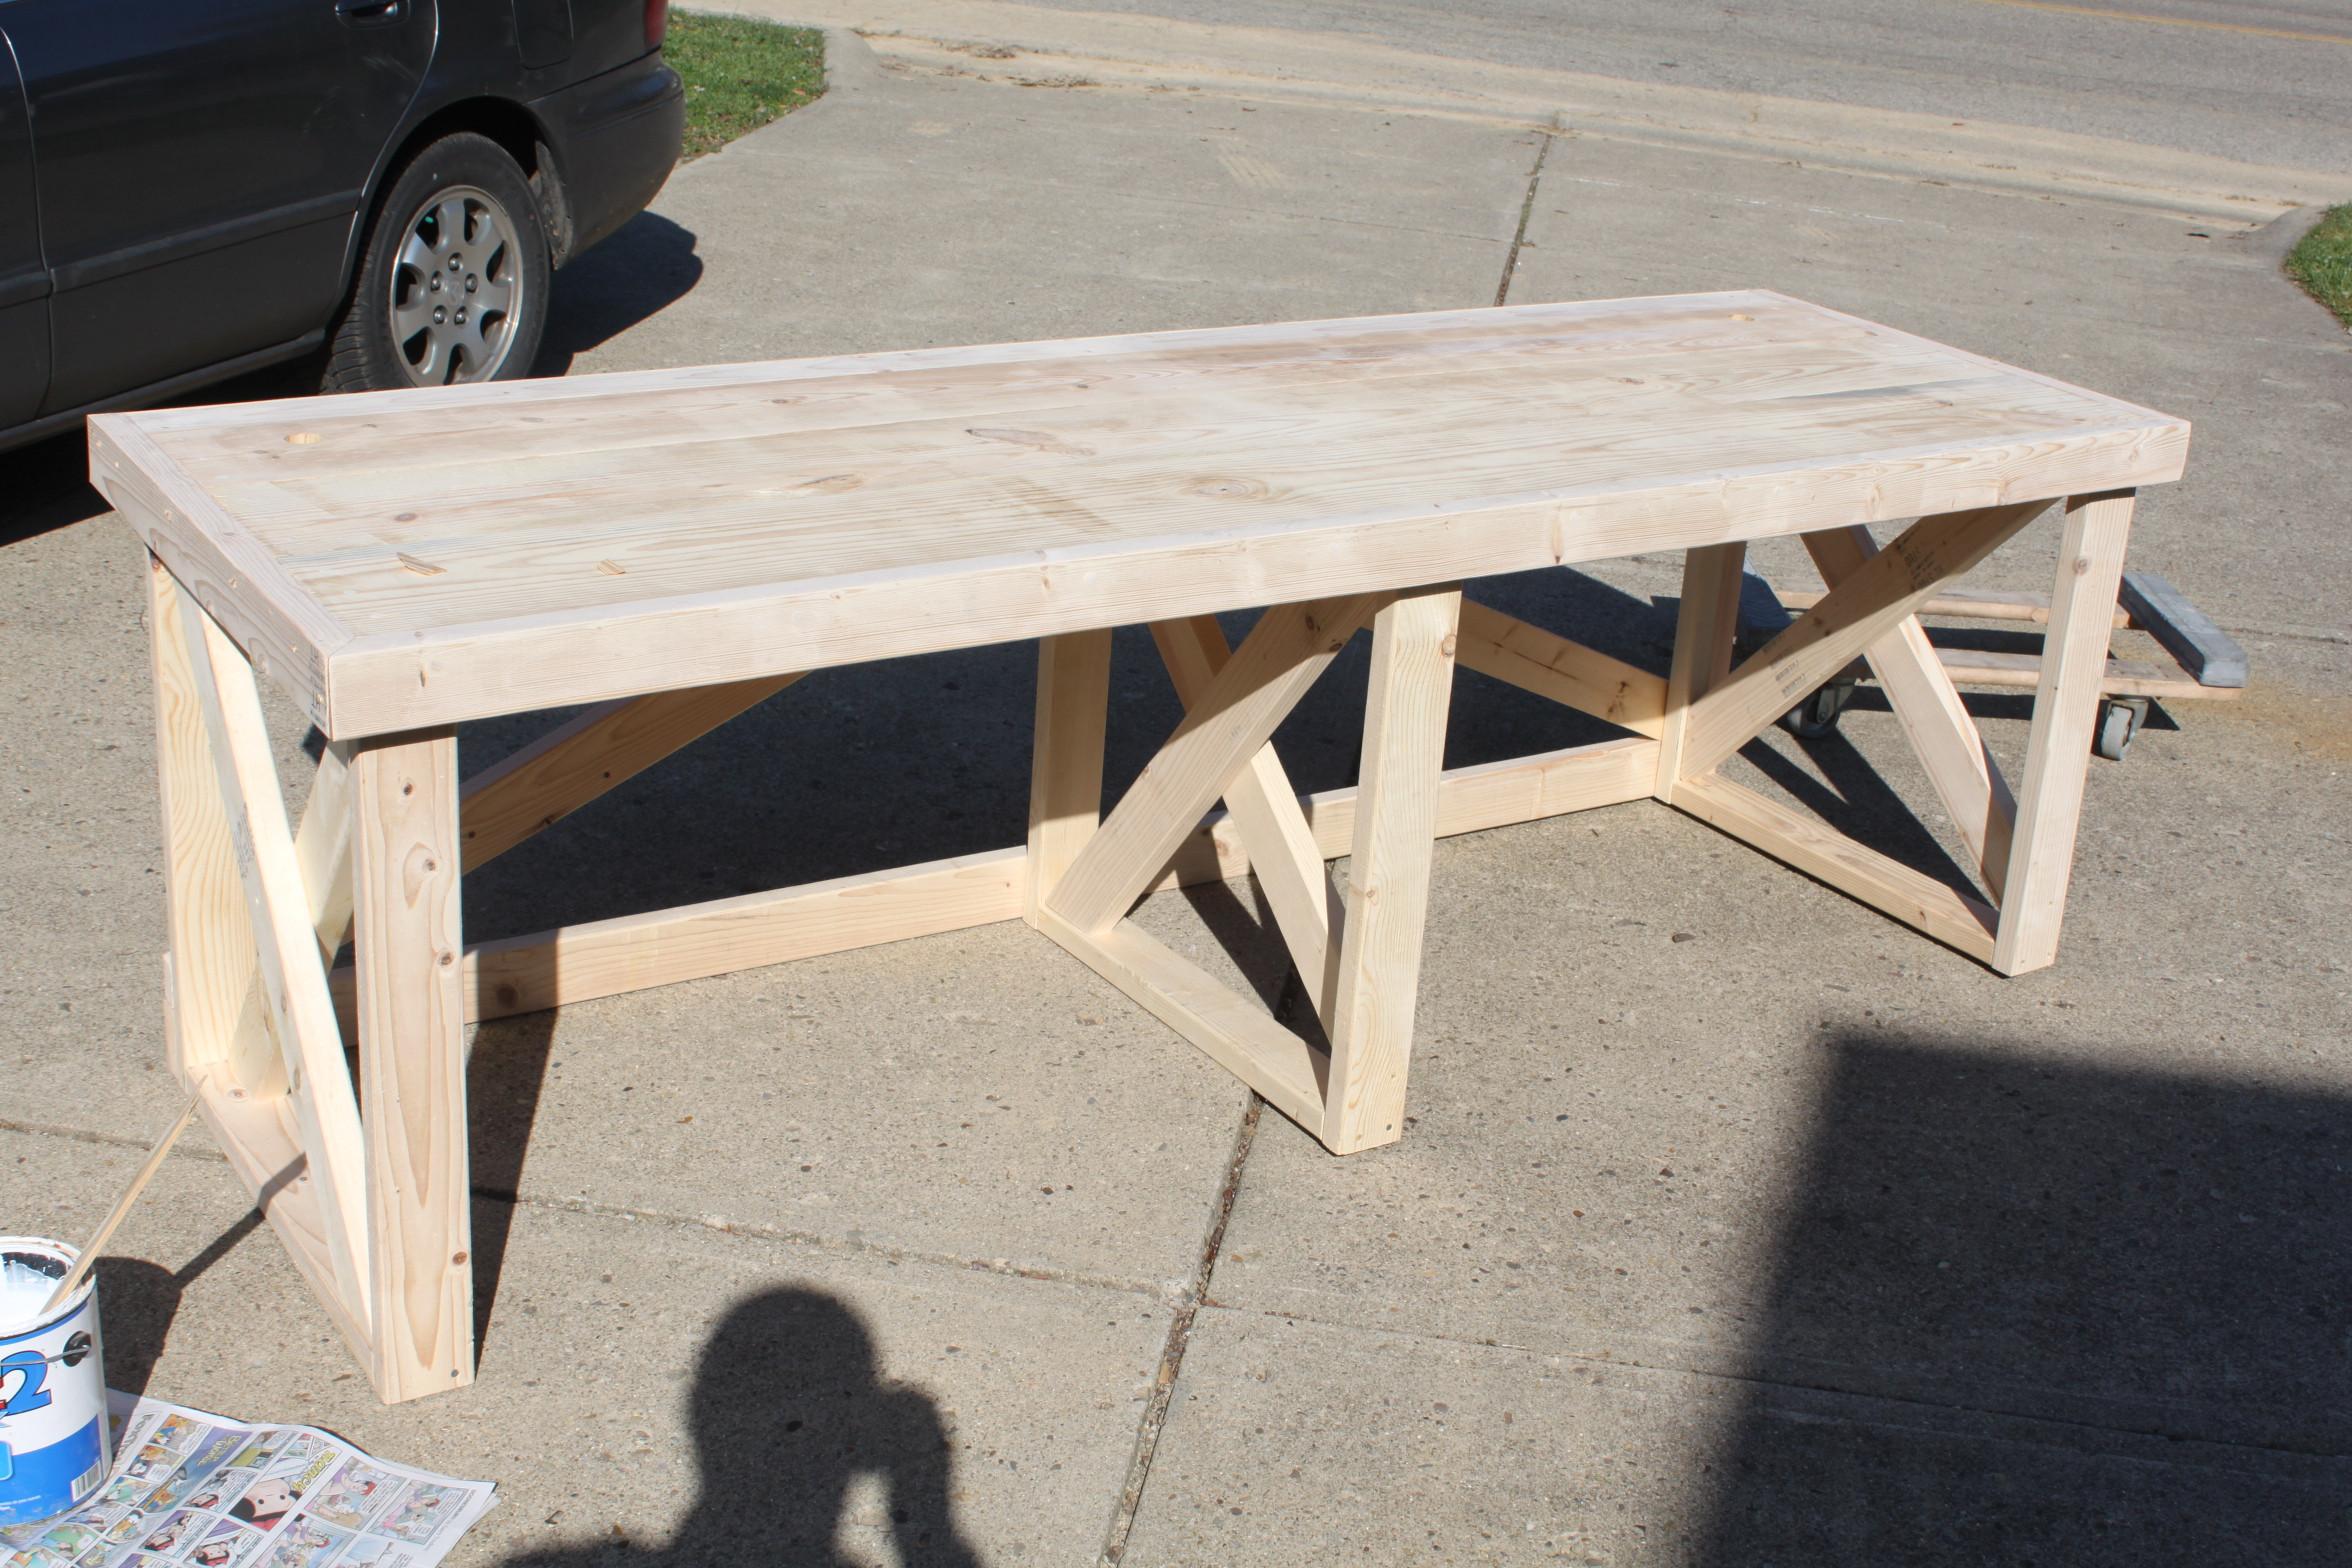 Best ideas about DIY Wood Desk . Save or Pin DIY Desk Plans 2×4 PDF Download wood fence hardware Now.